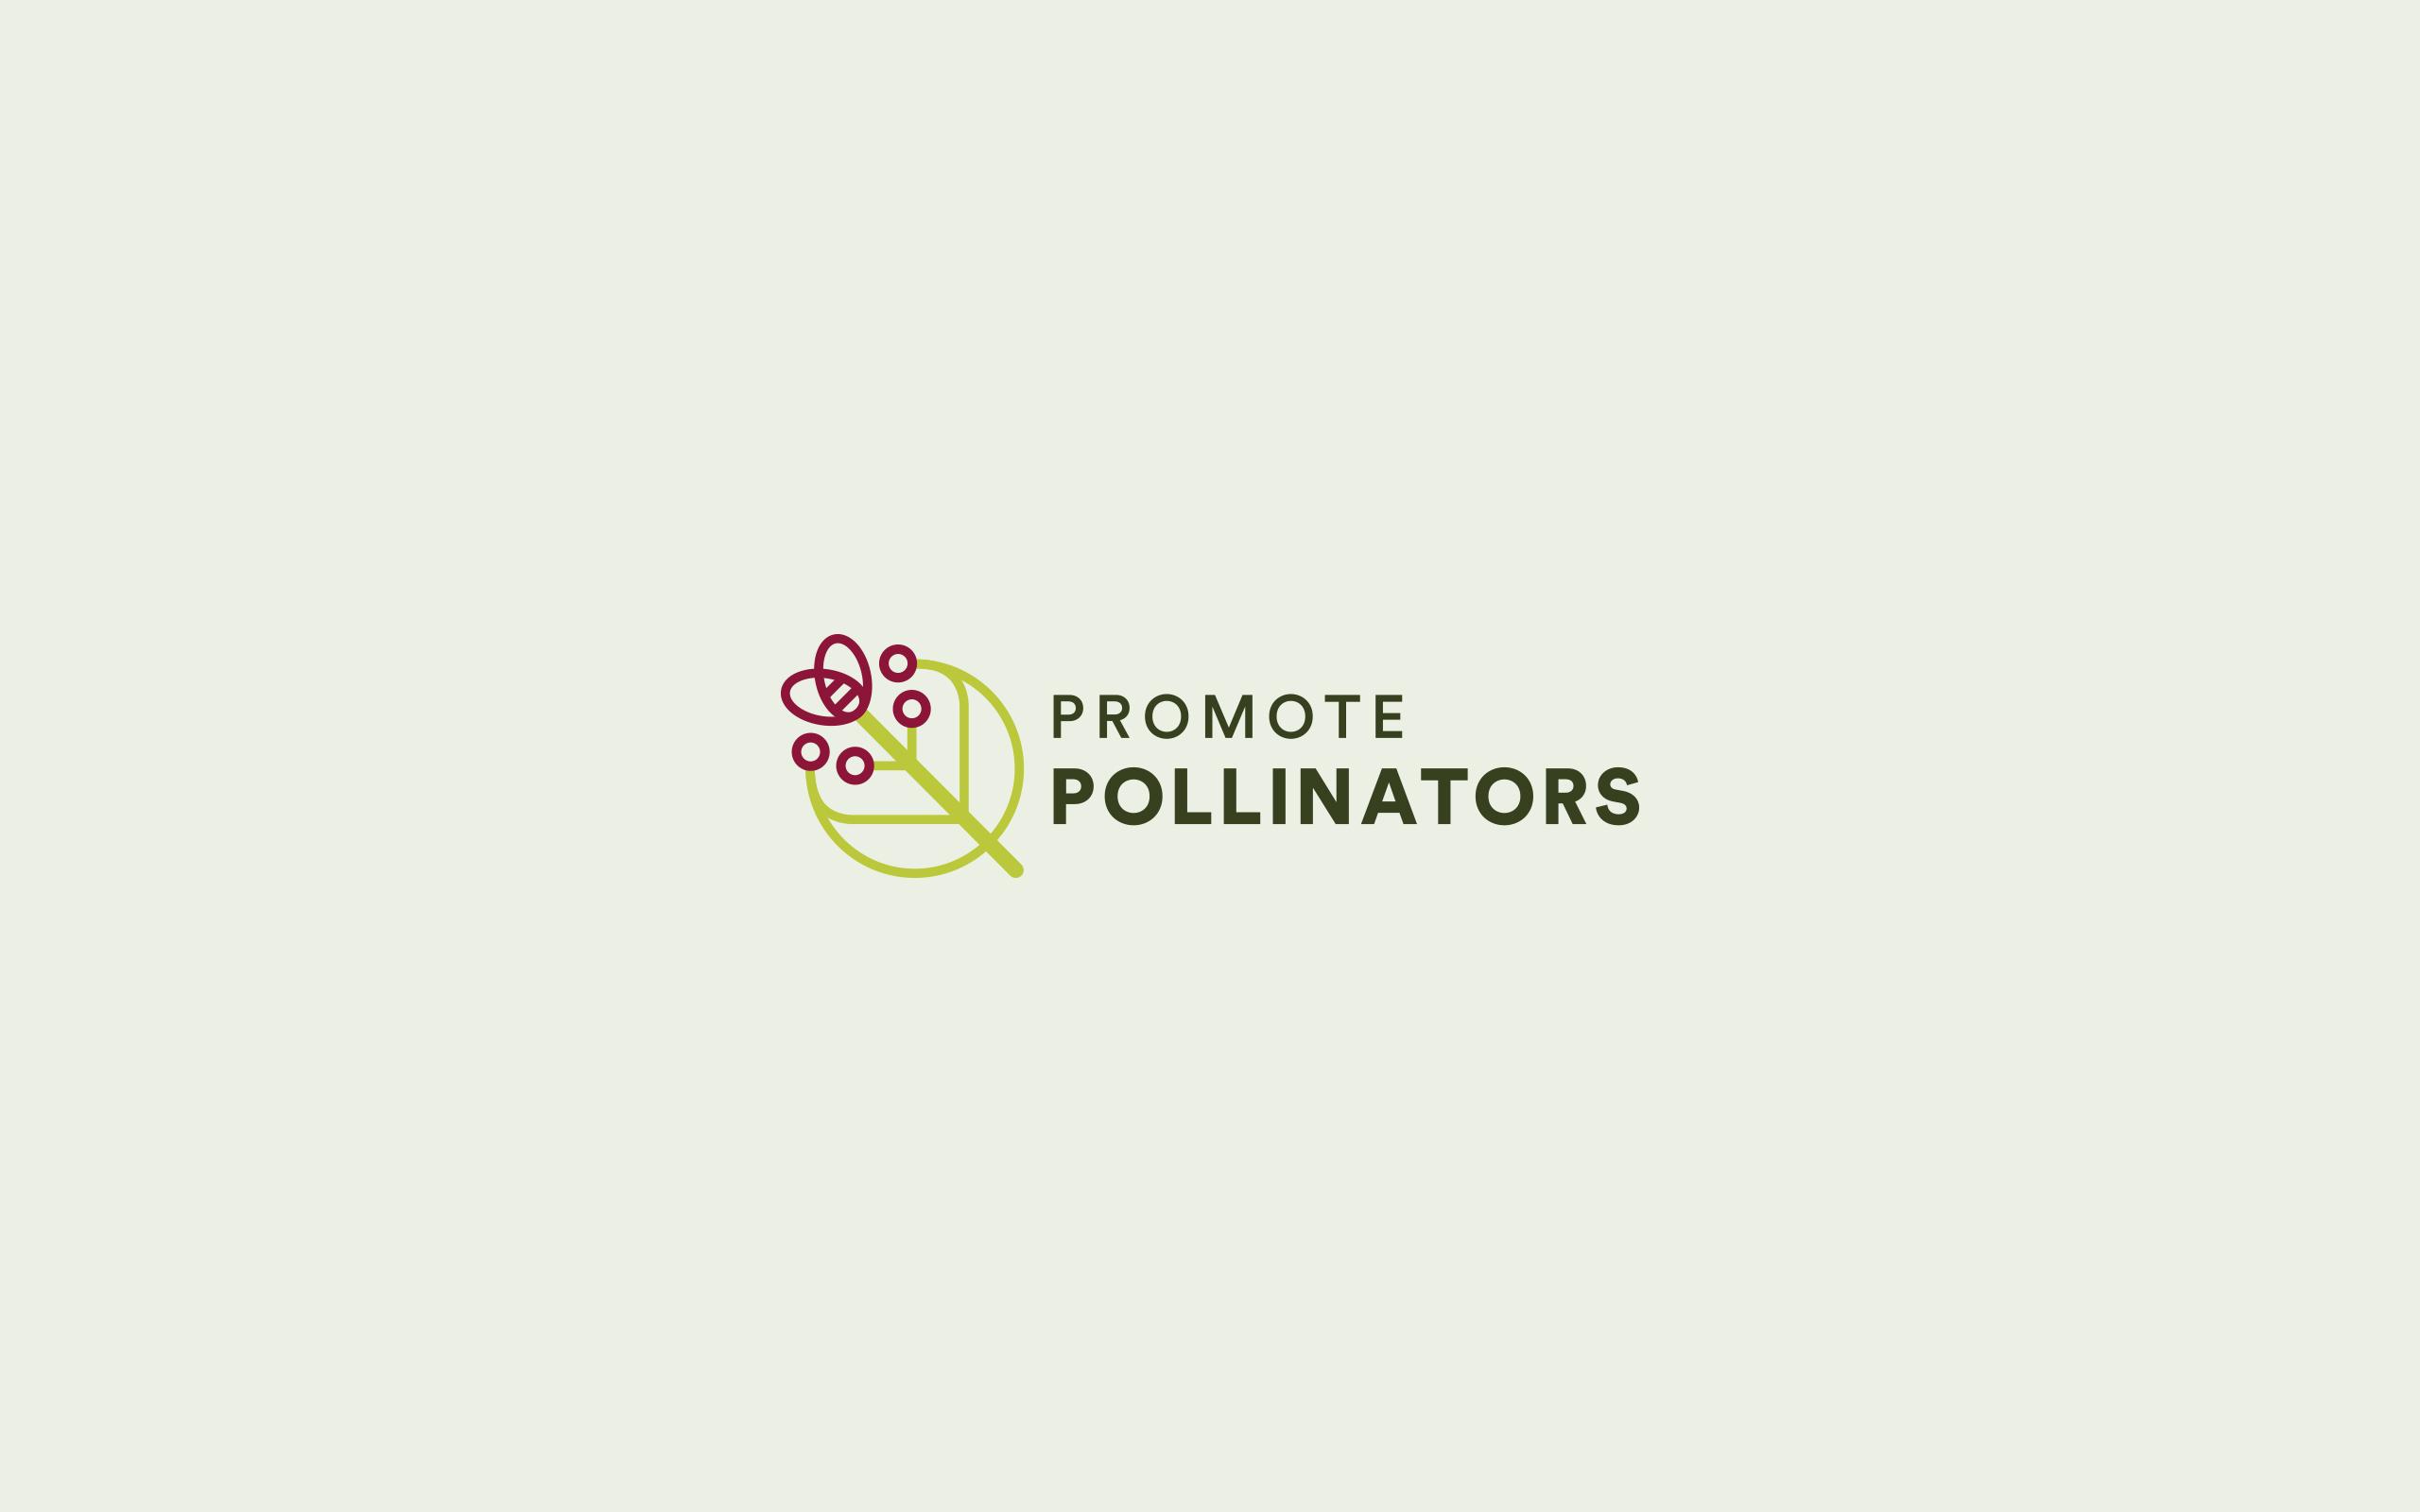 Logo Design for Promote Pollinators